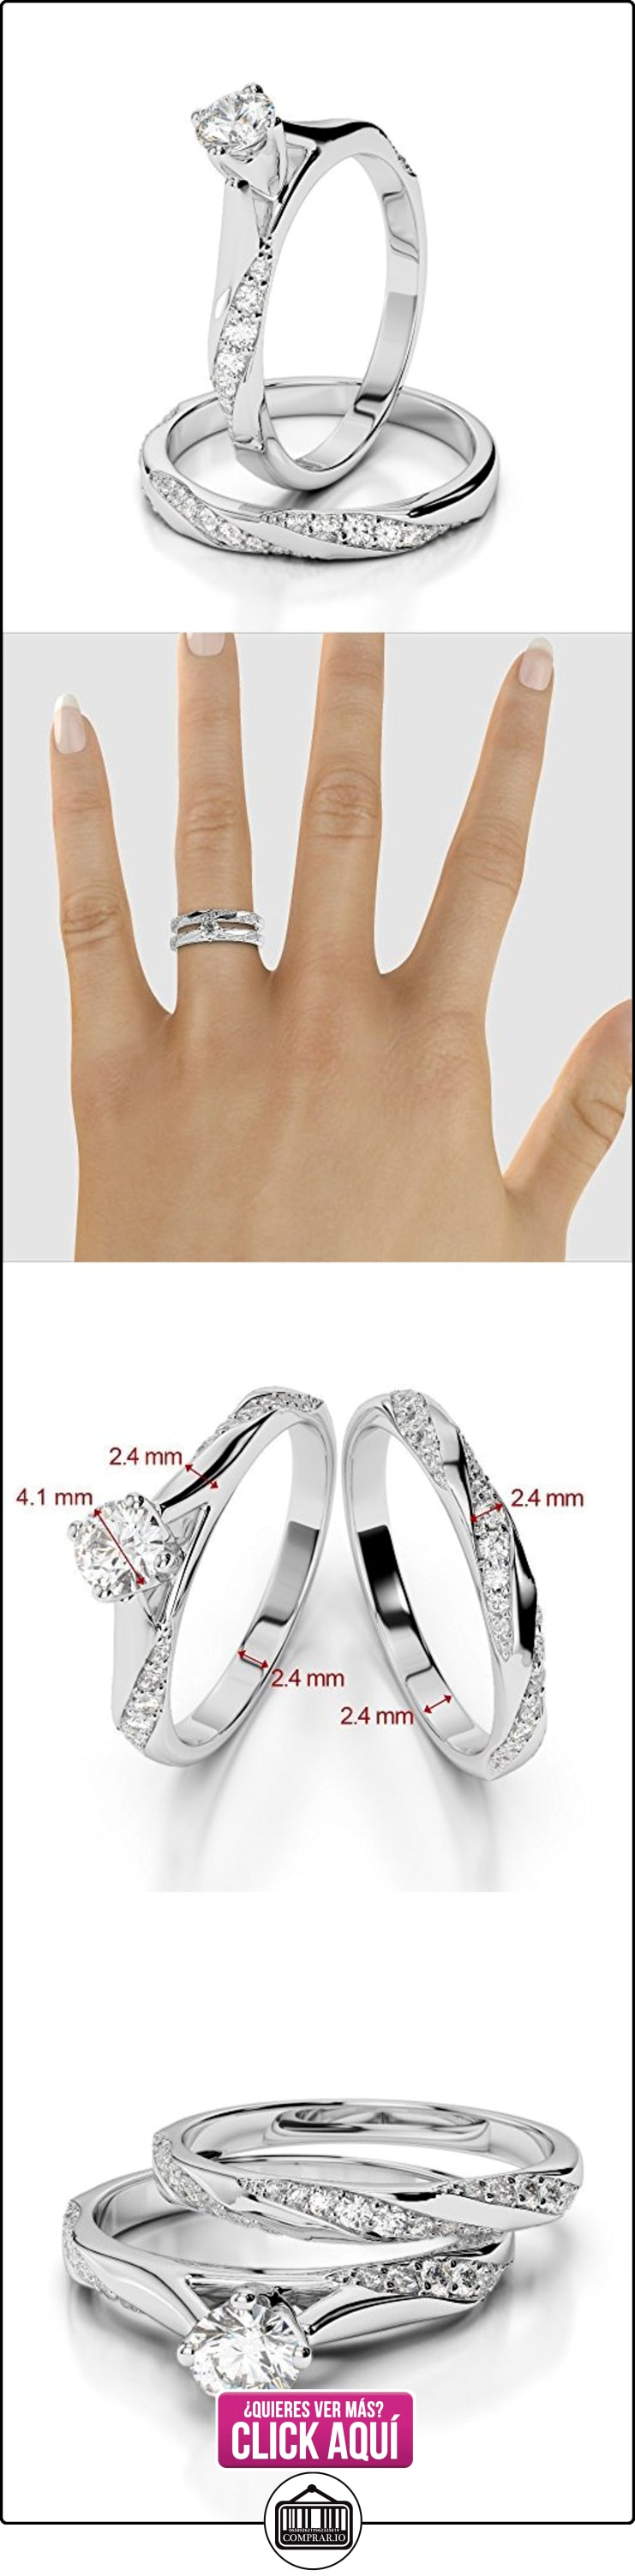 AG & Sons Hombre  750 Gold  oro blanco Round Brilliant Cut   G-H diamante  ✿ Joyas para hombres especiales - lujo ✿ ▬► Ver oferta: http://comprar.io/goto/B01I5F34JA